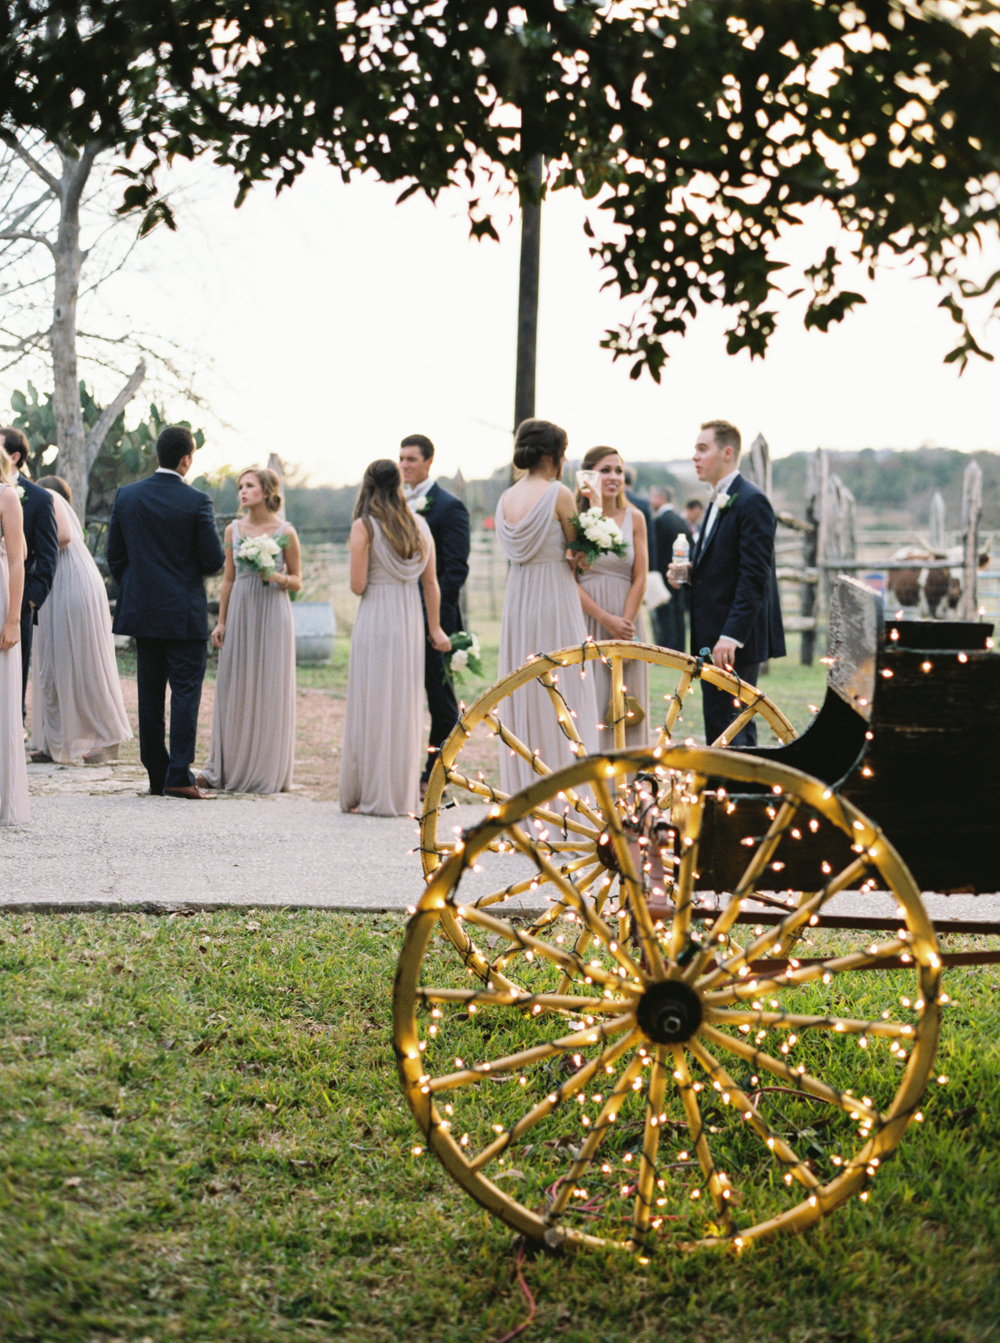 BOERNE WEDDING PHOTOGRAPHER-54.jpg